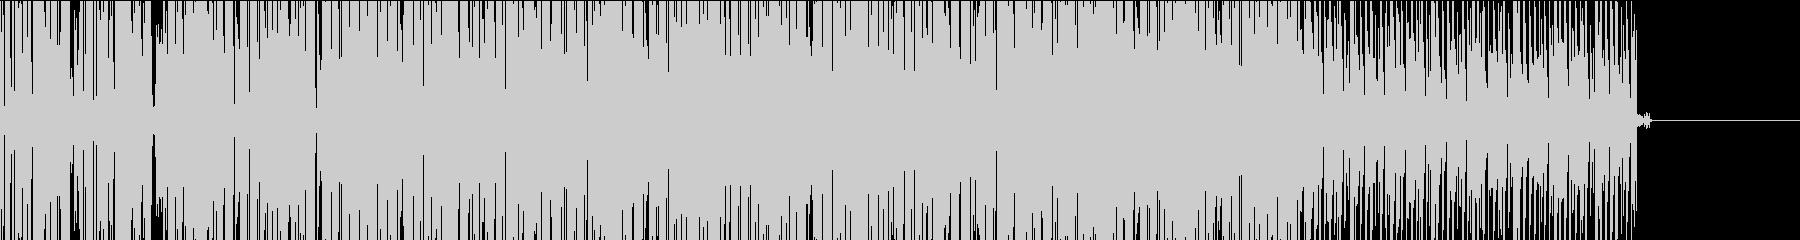 TV・ラジオニュースのシーケンスBGMの未再生の波形